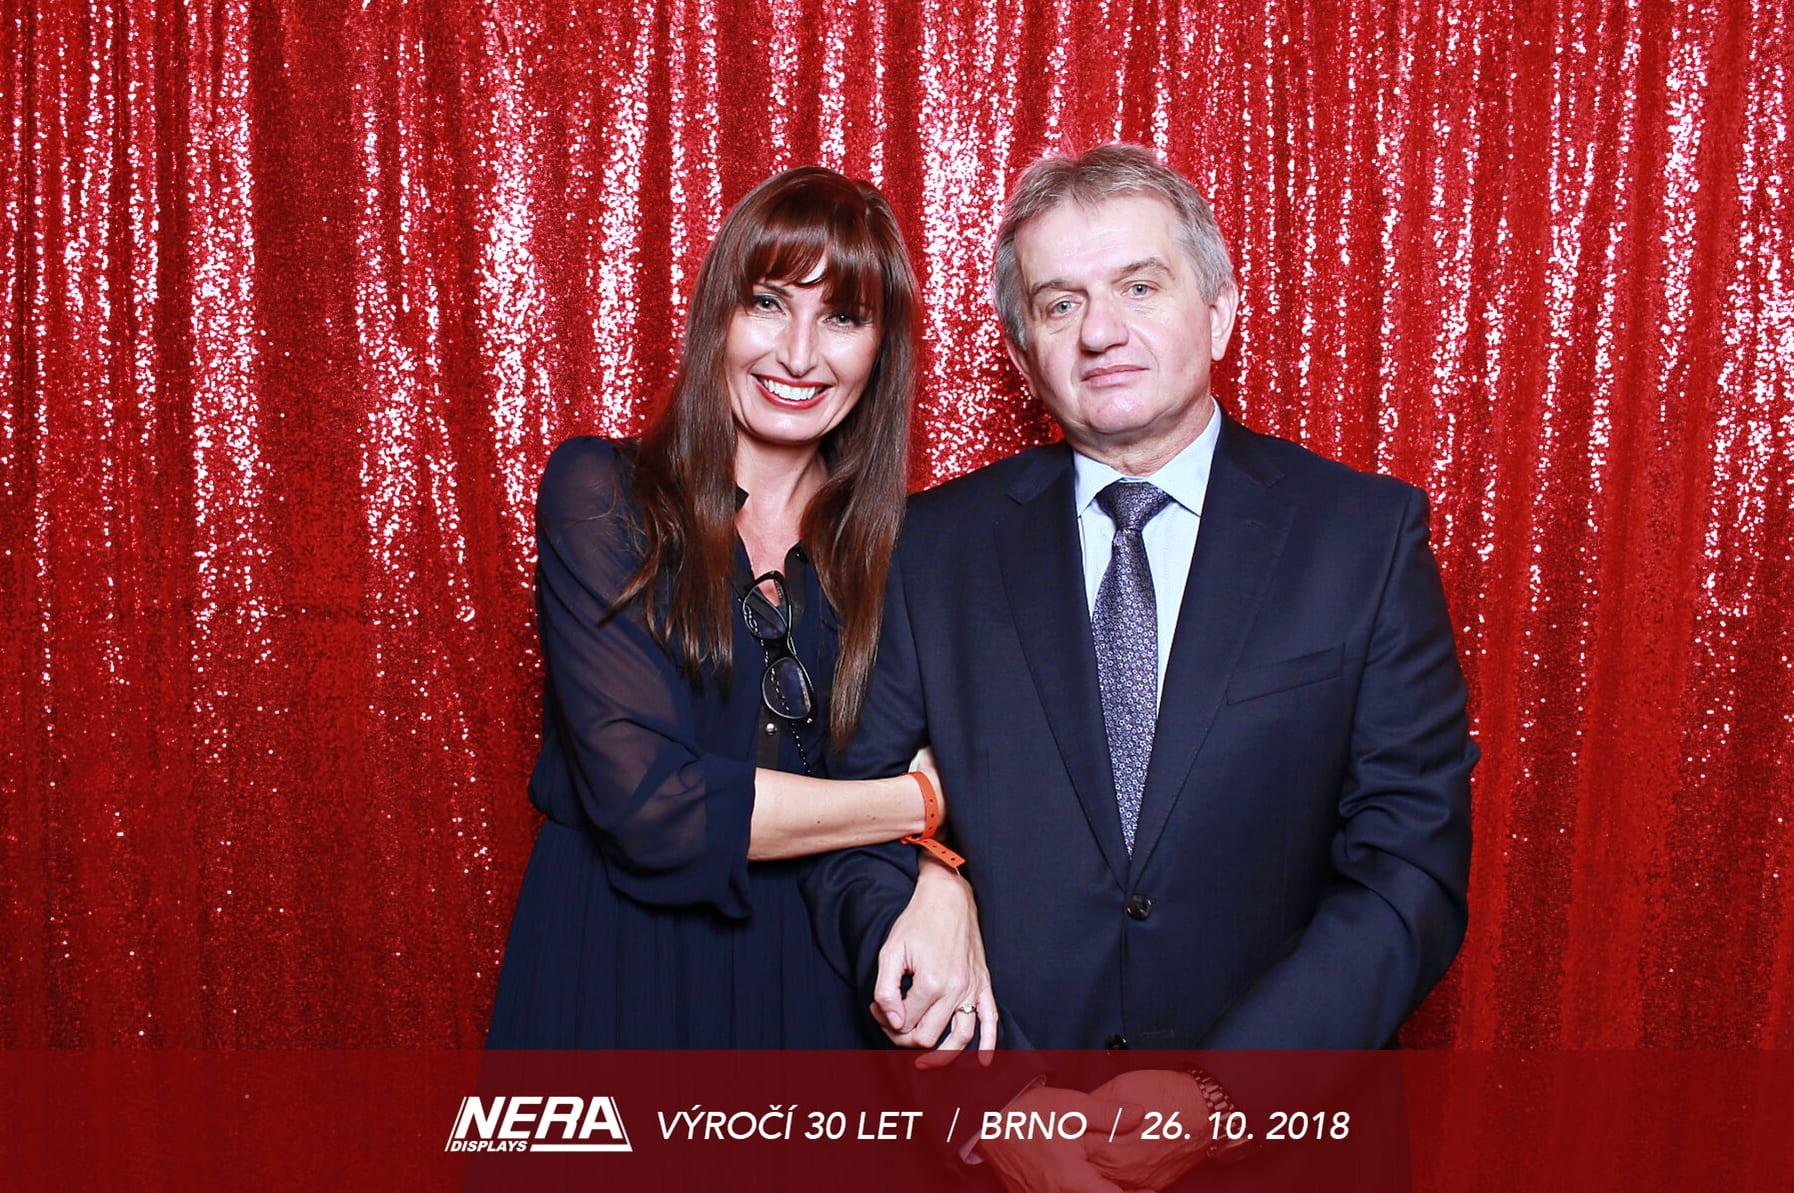 fotokoutek-nera-26-10-2018-510678